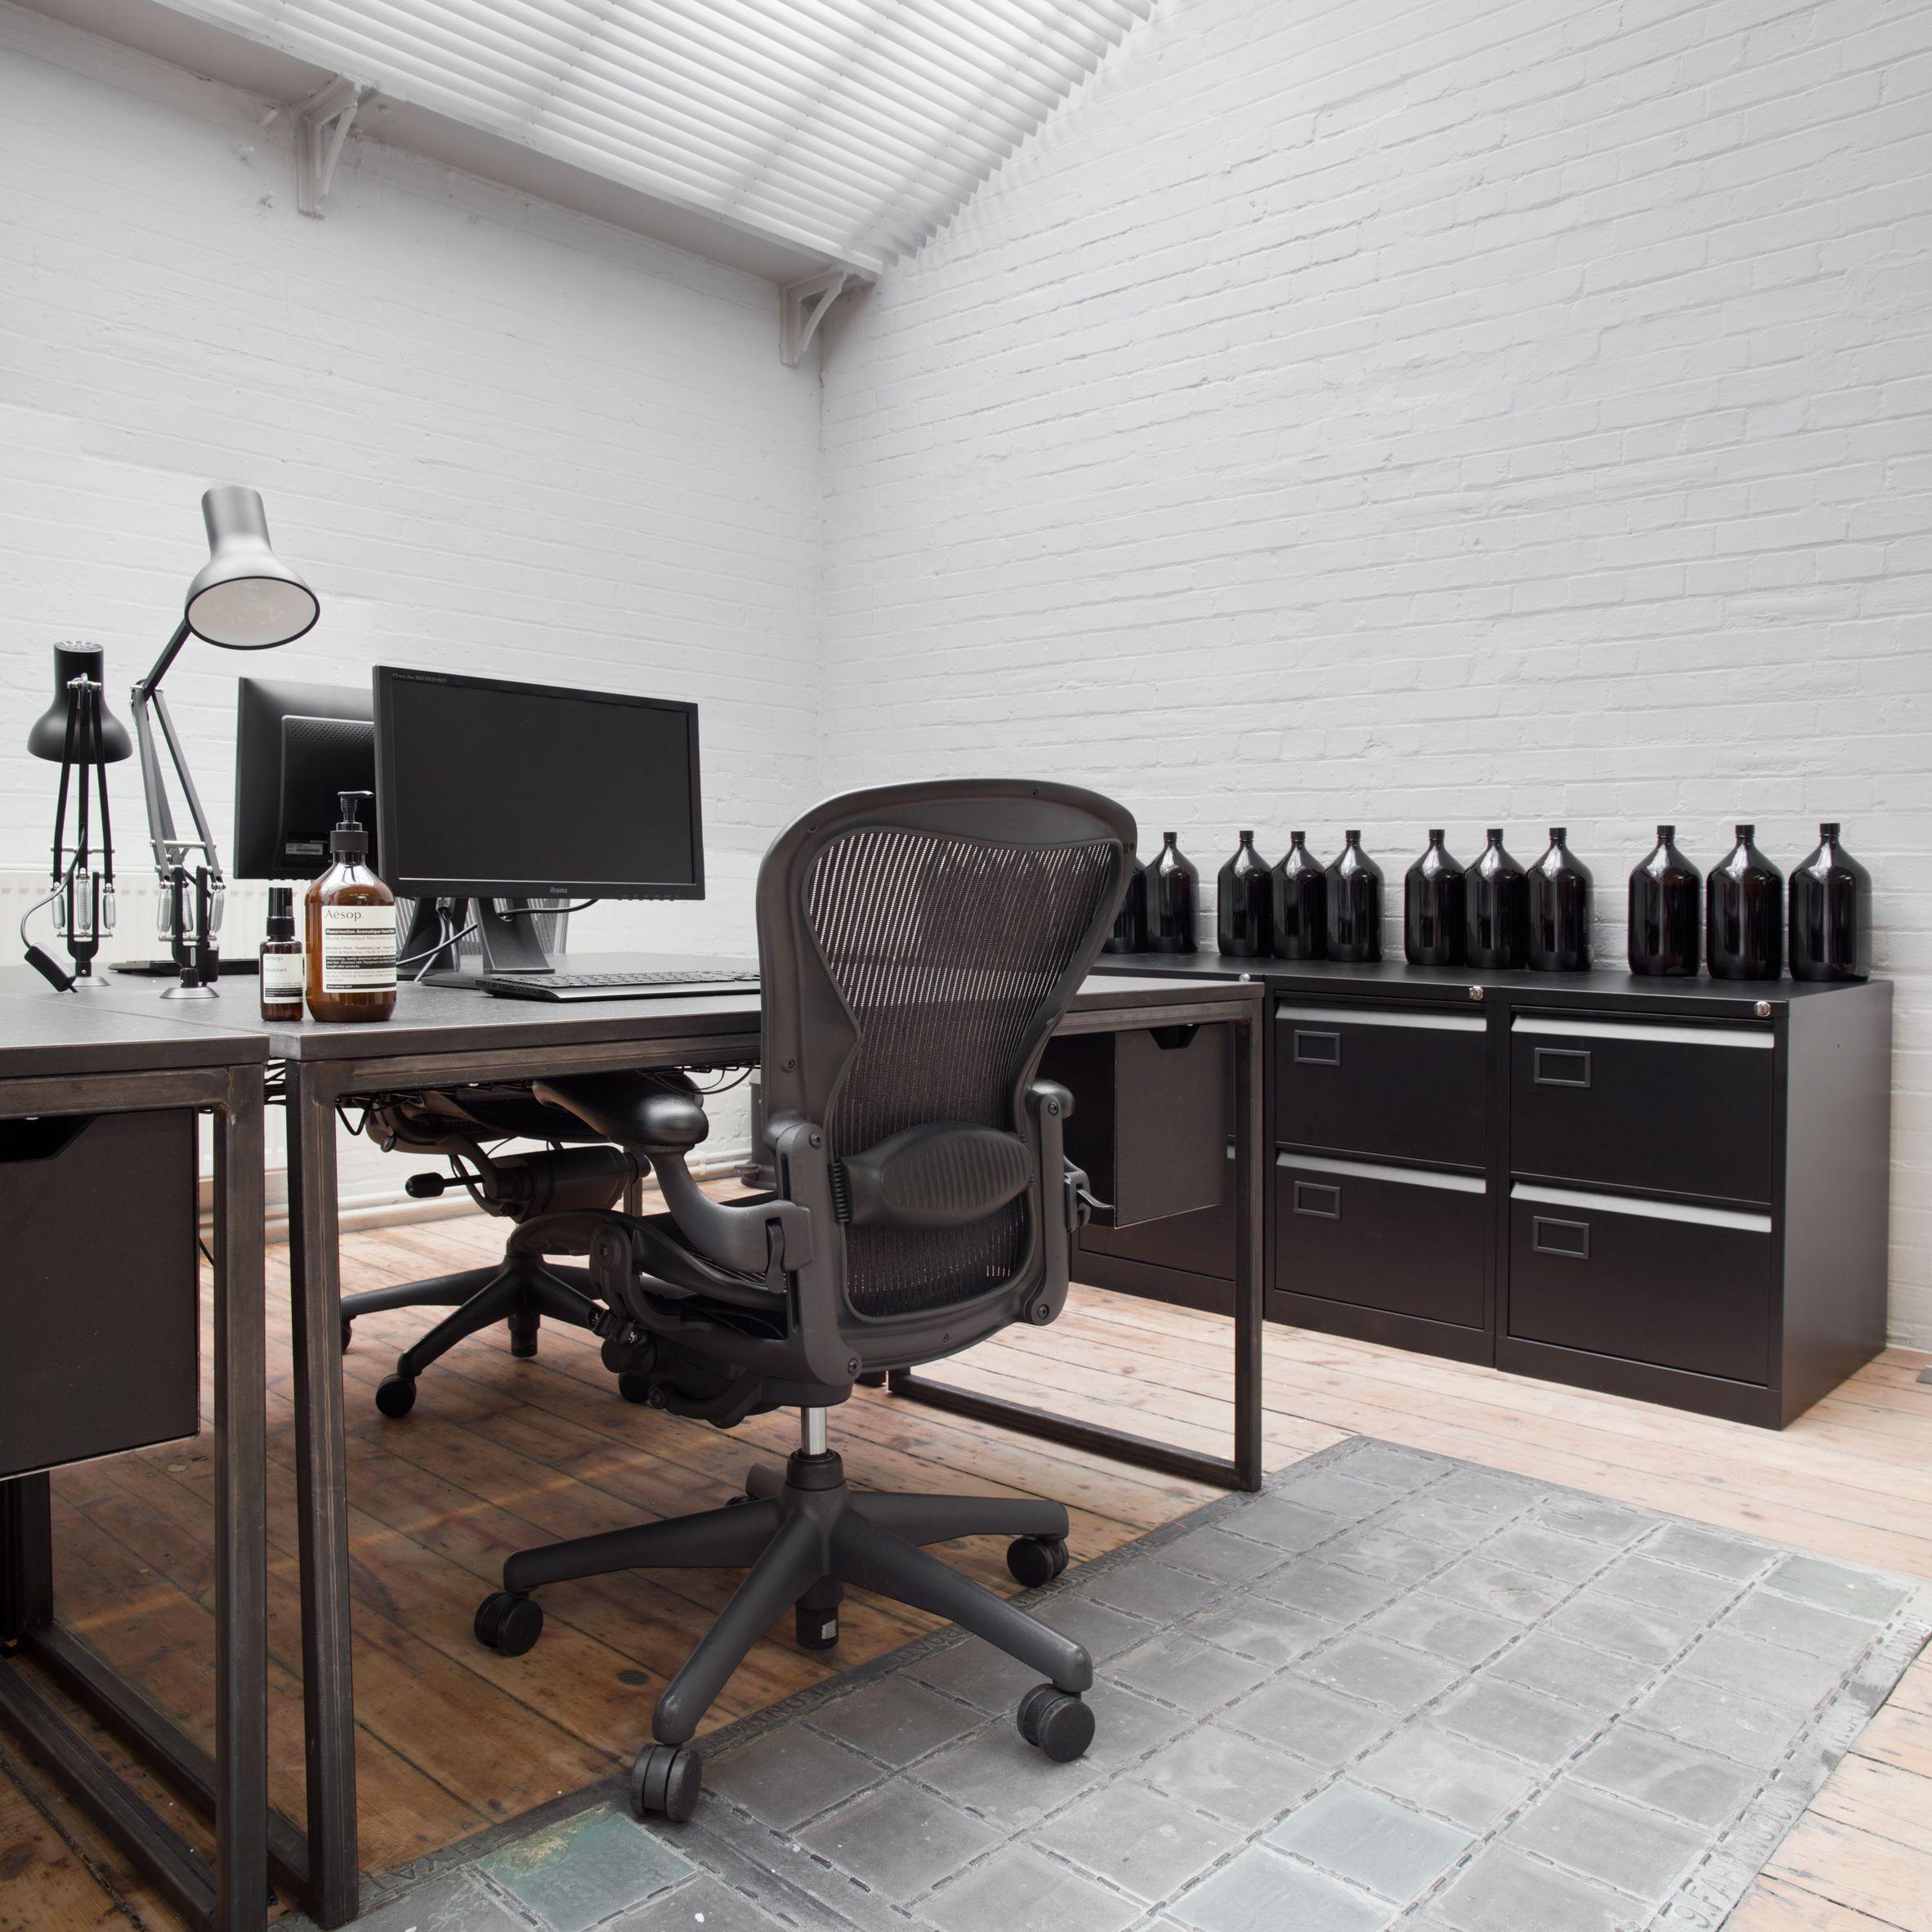 12 of the best minimalist office interiors